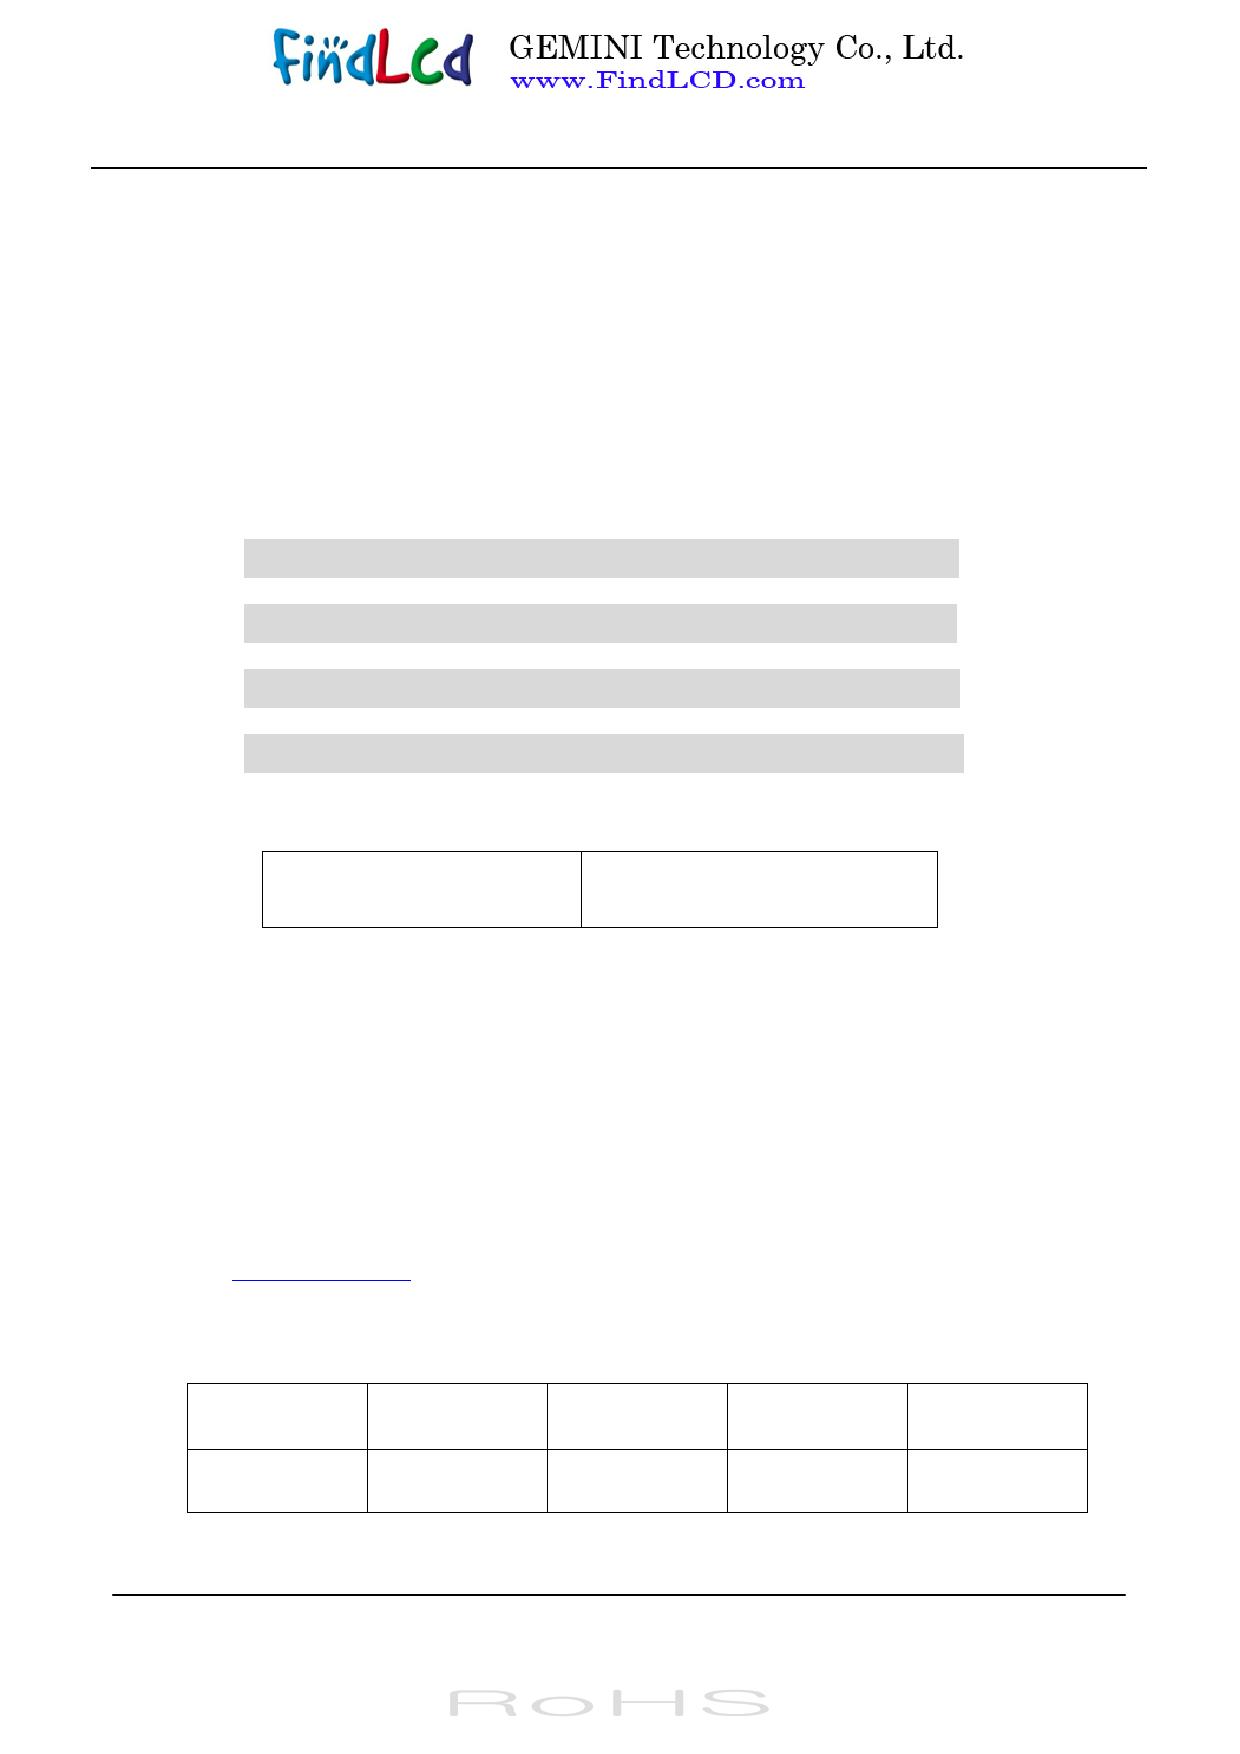 TM128128B2CCWG 데이터시트 및 TM128128B2CCWG PDF